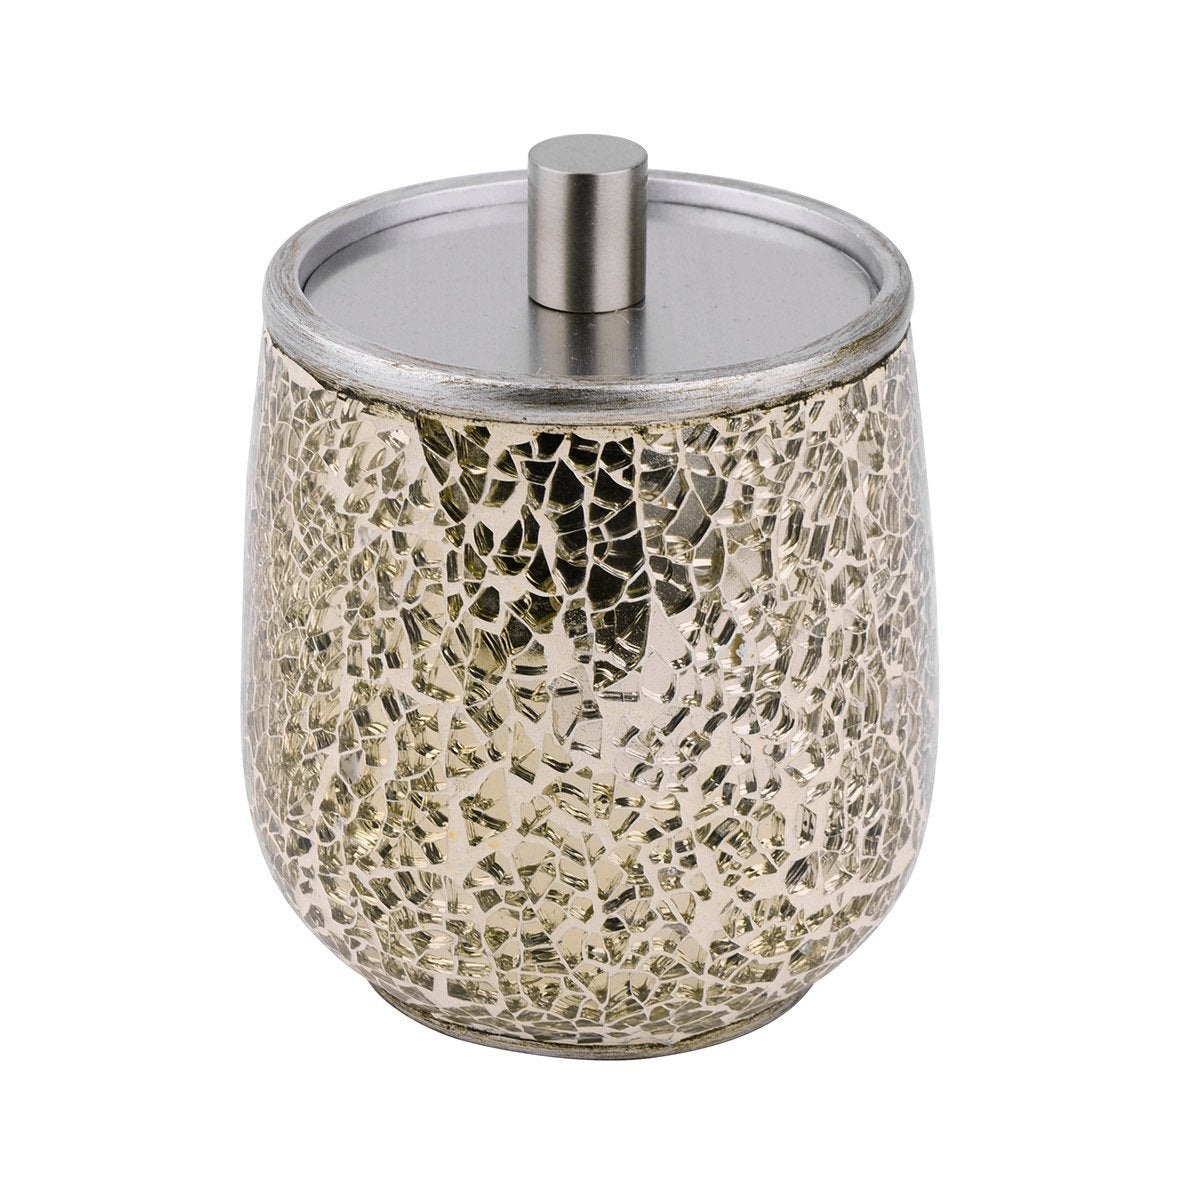 Boîte céramique Chic glam, or